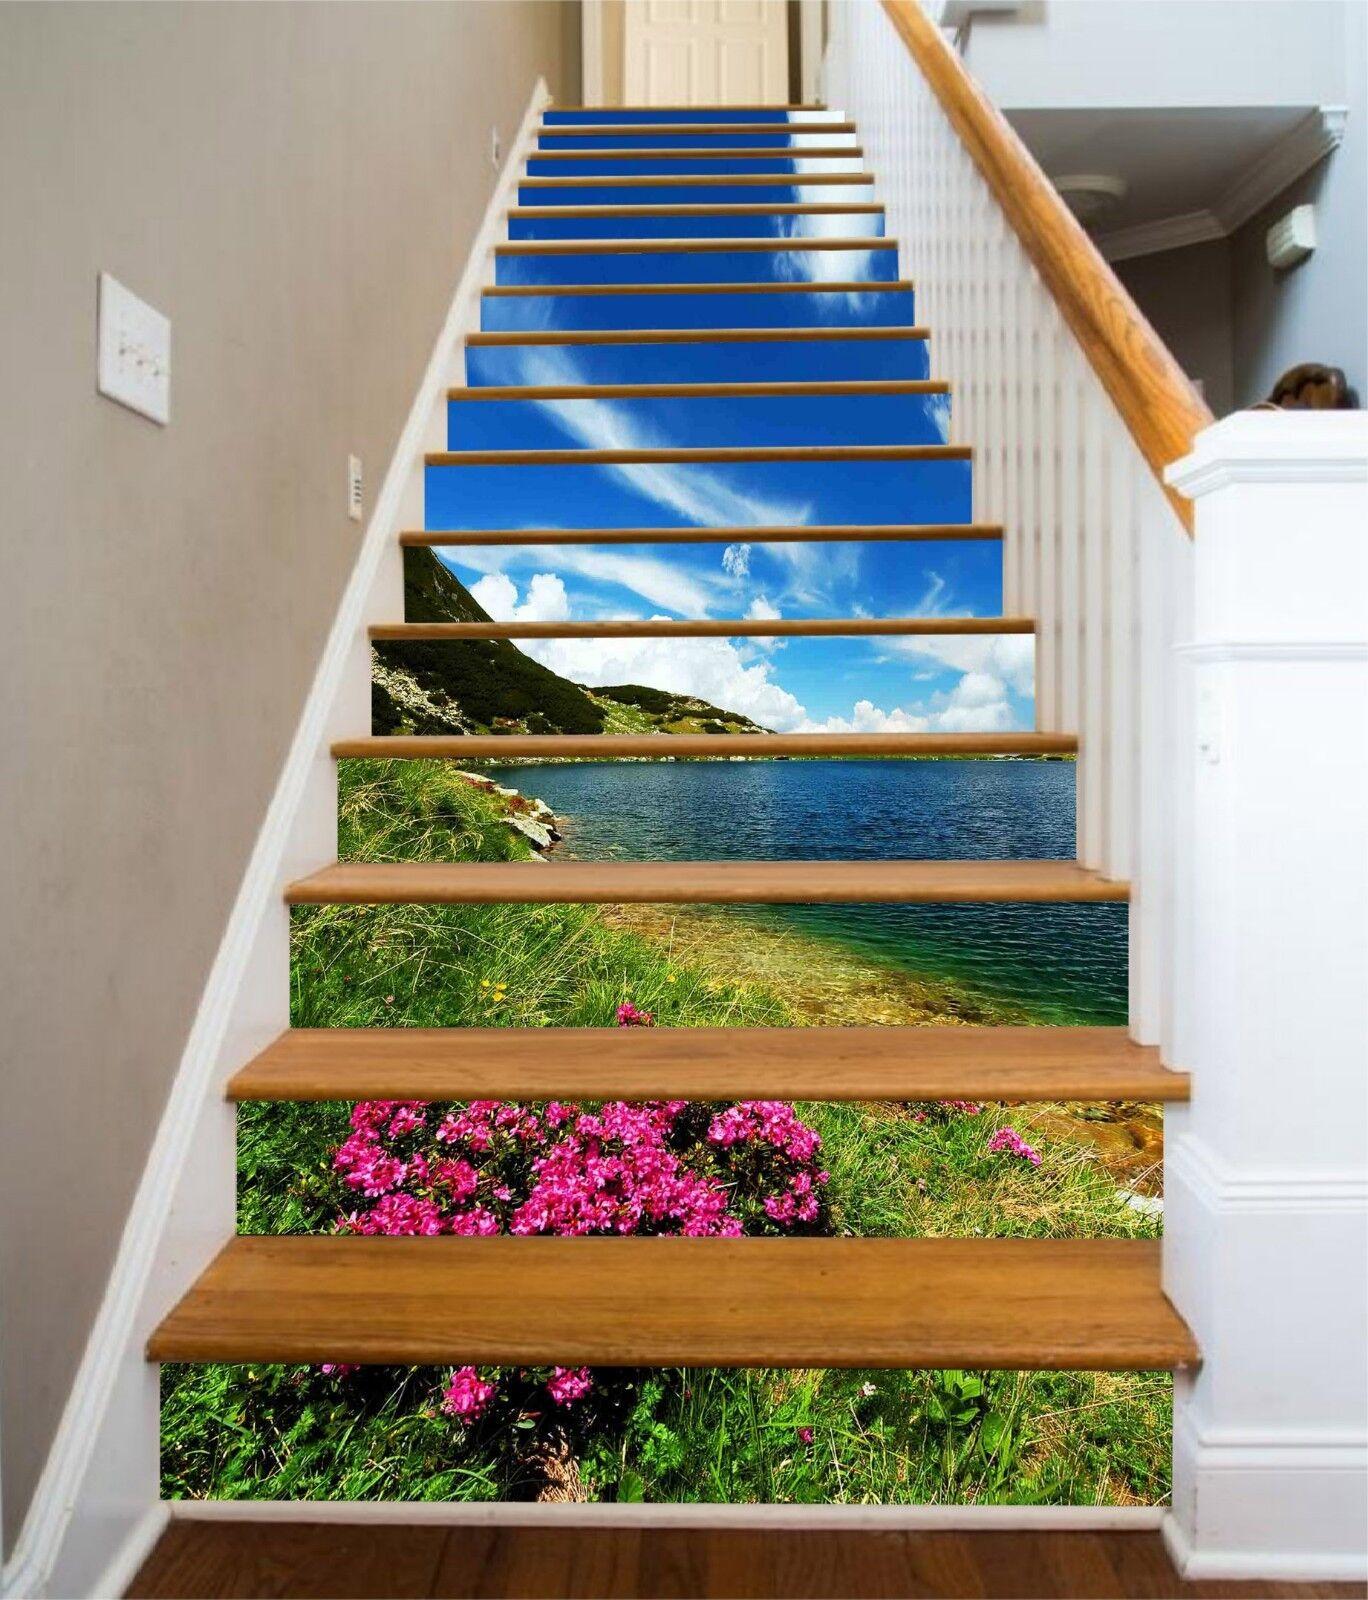 3D Meadow Flower Stair Risers Decoration Photo Mural Vinyl Decal Wallpaper CA